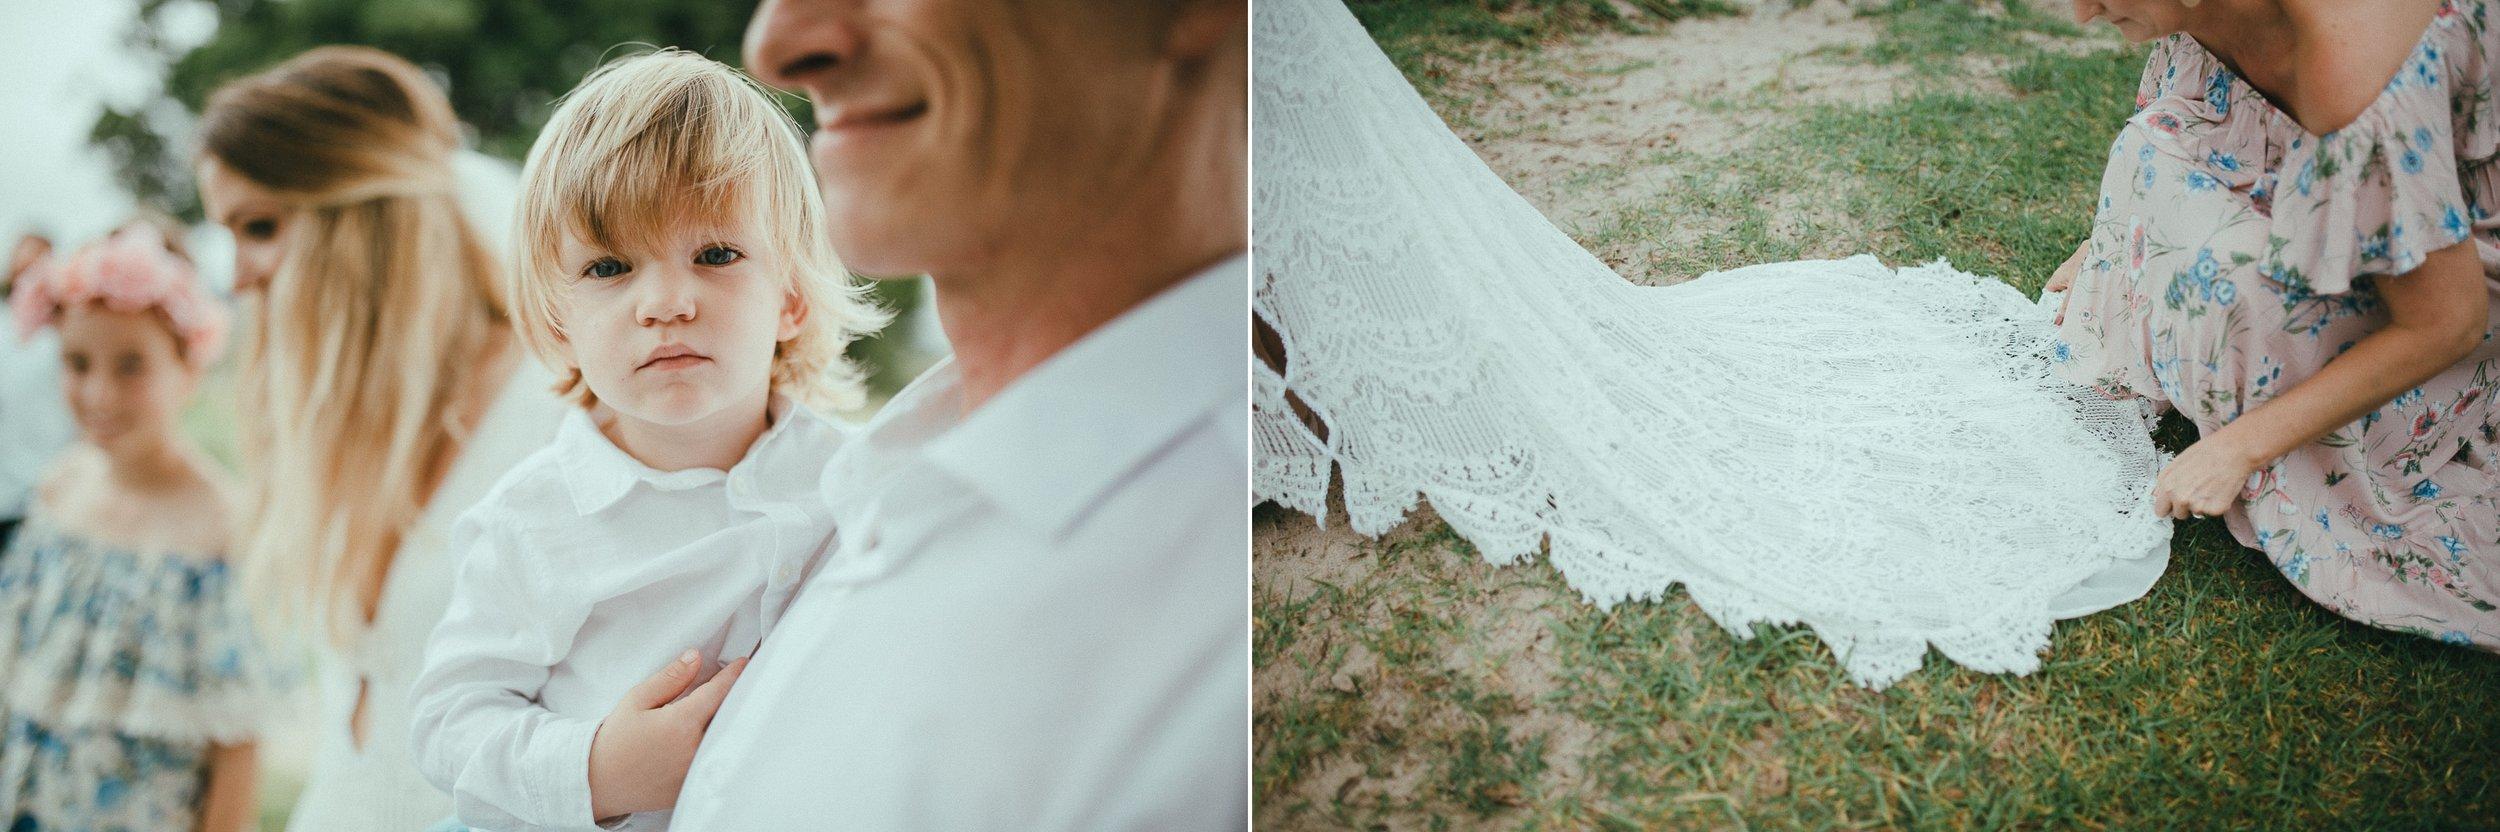 emotional-wedding-new-zealand85.jpg